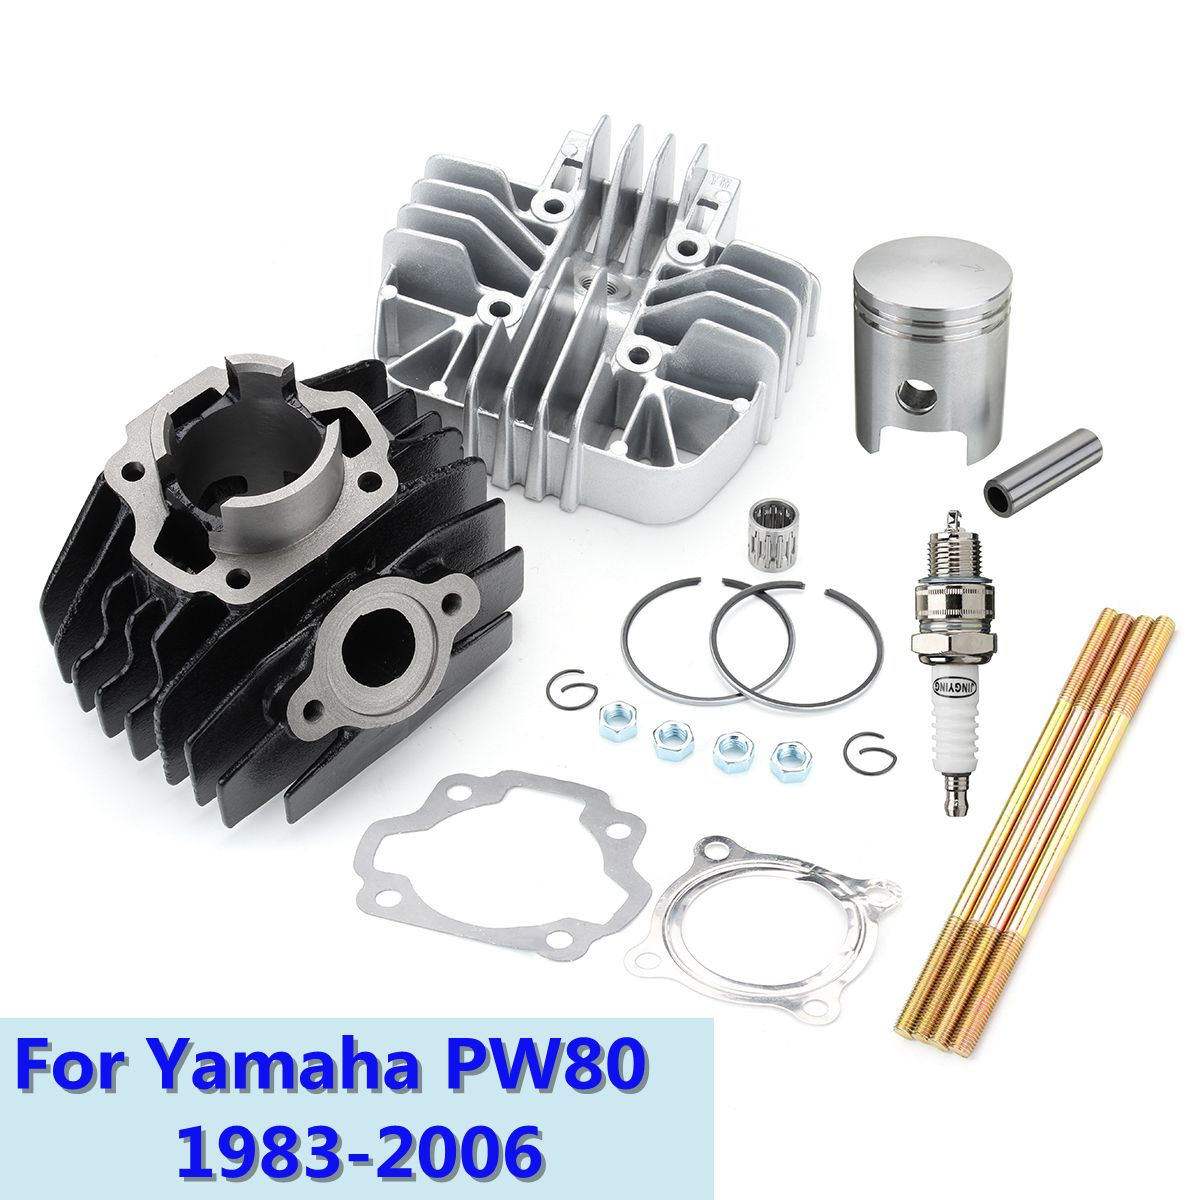 Zylinder Kolben Motor Kopf Dichtung Clip Top Ende Kit für Yamaha PW80 1983-2006 Motor Motor